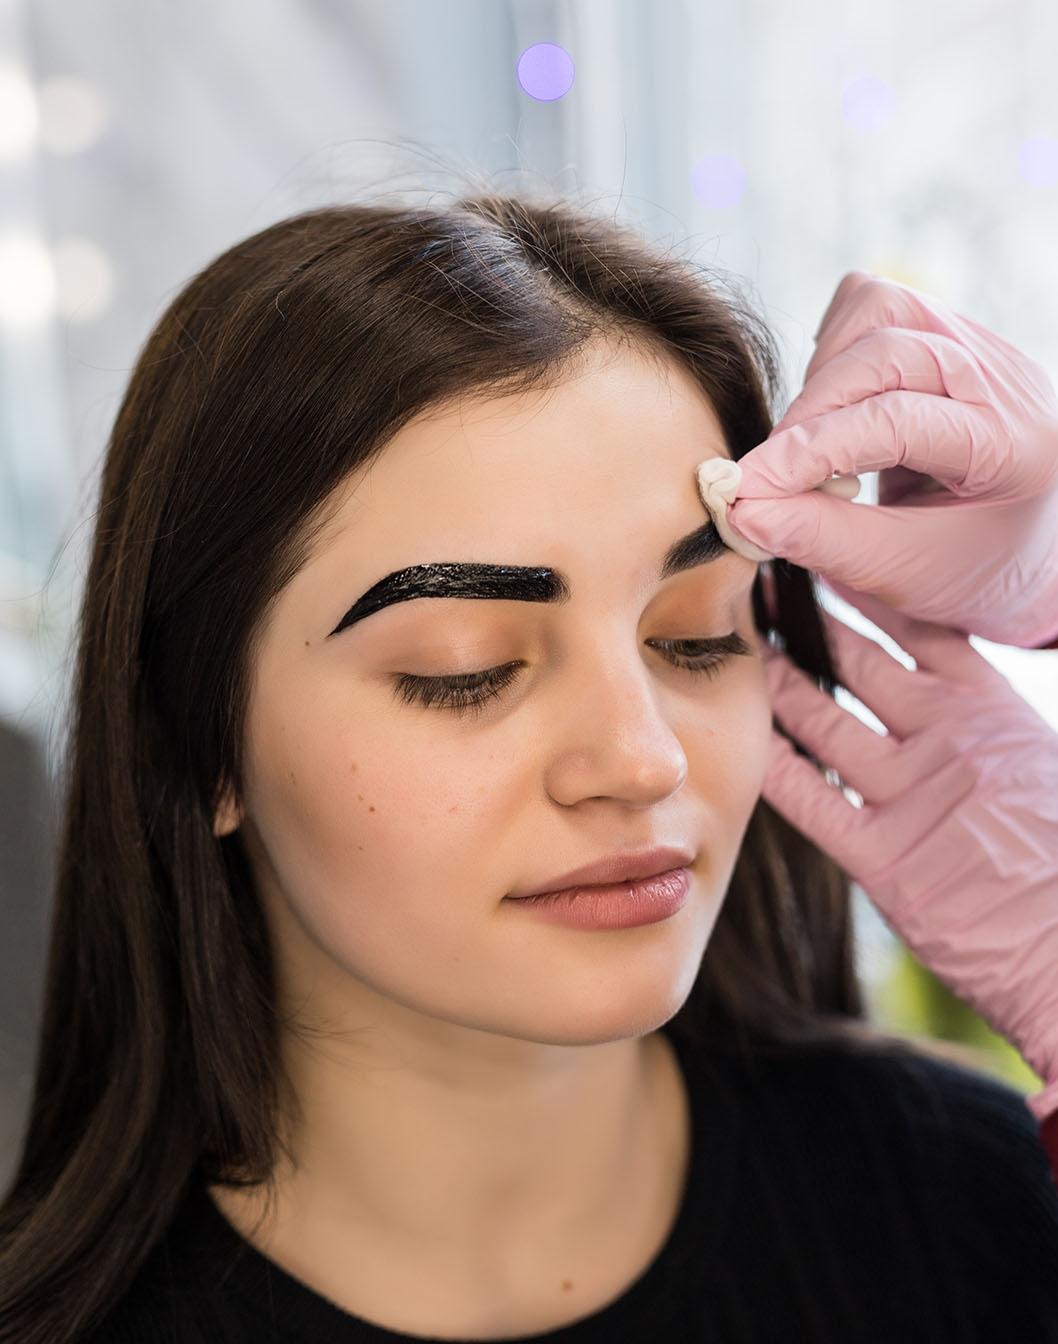 master doing final steps in make-up procedure in salon